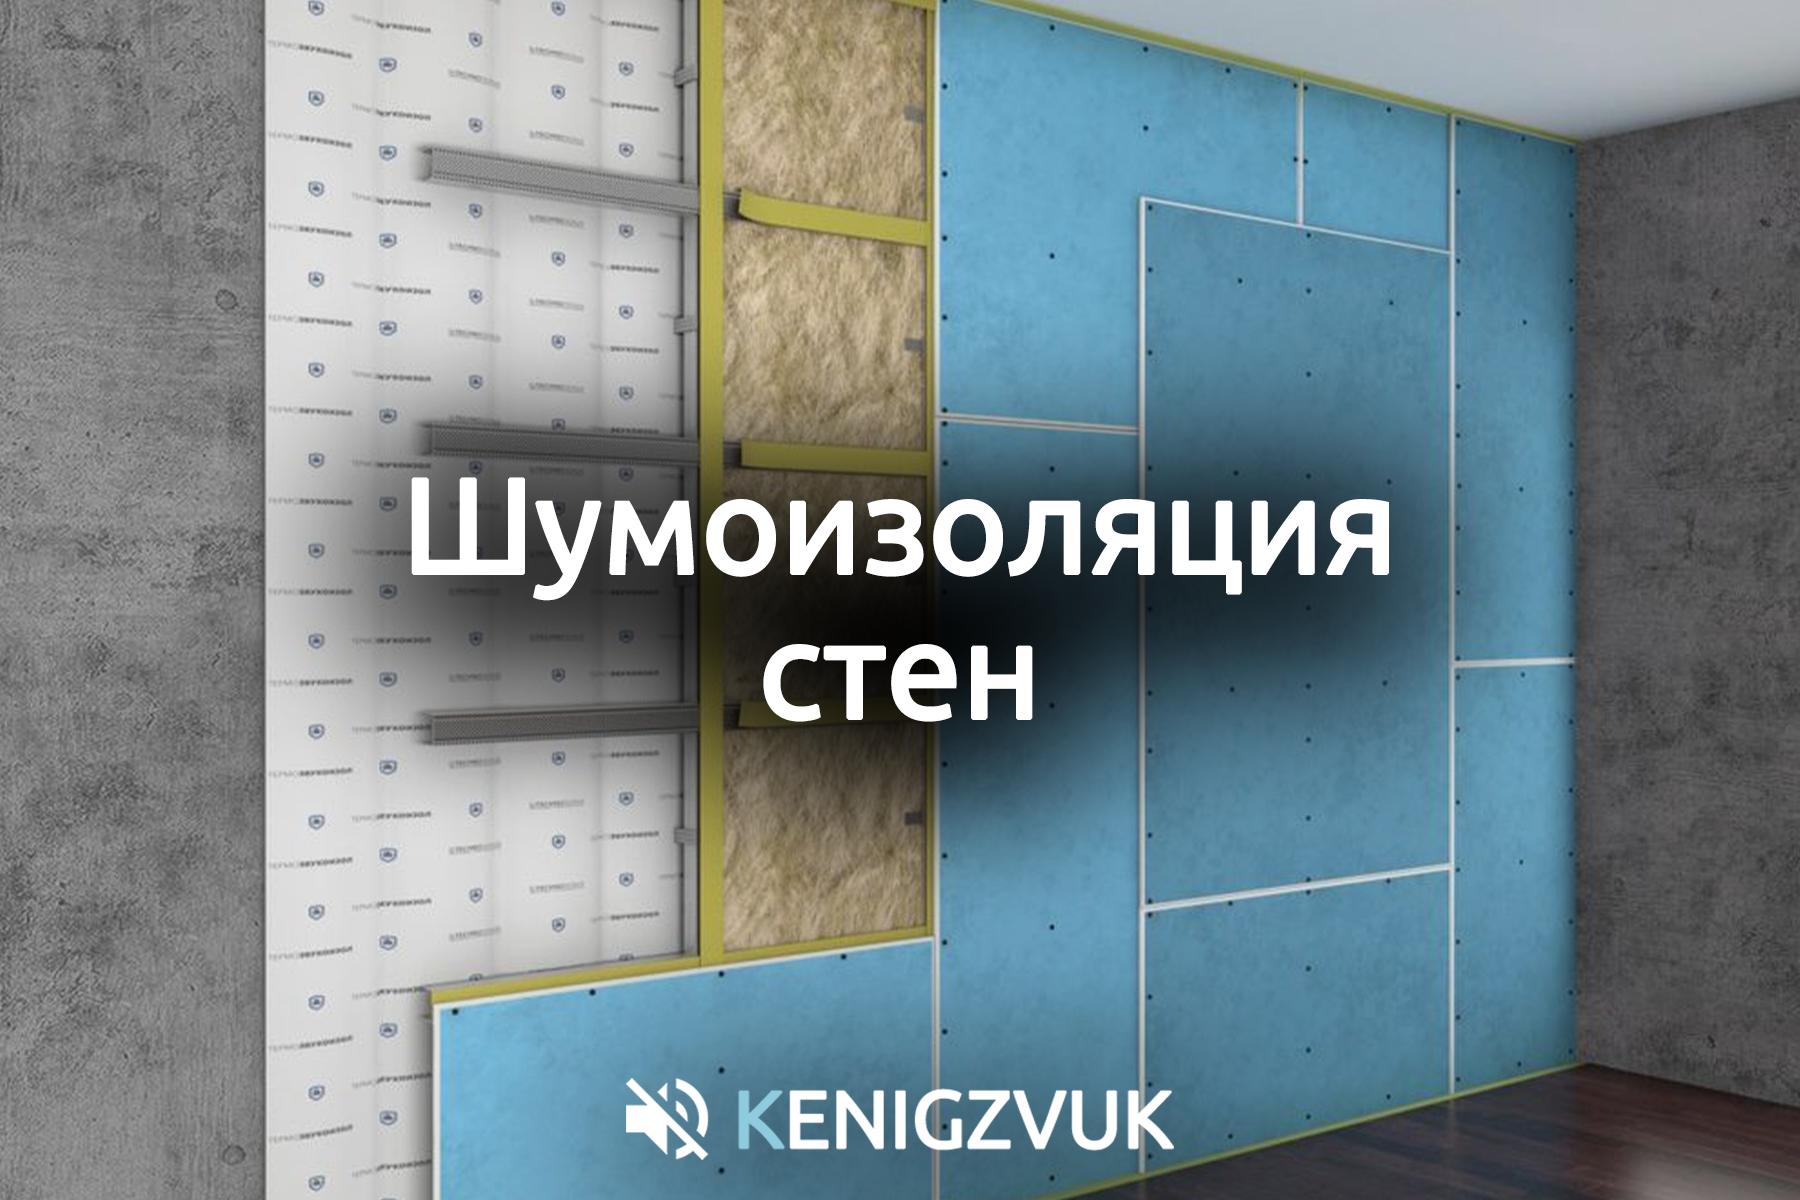 KenigZvuk | Звукоизоляция Калининград - Шумоизоляция стен